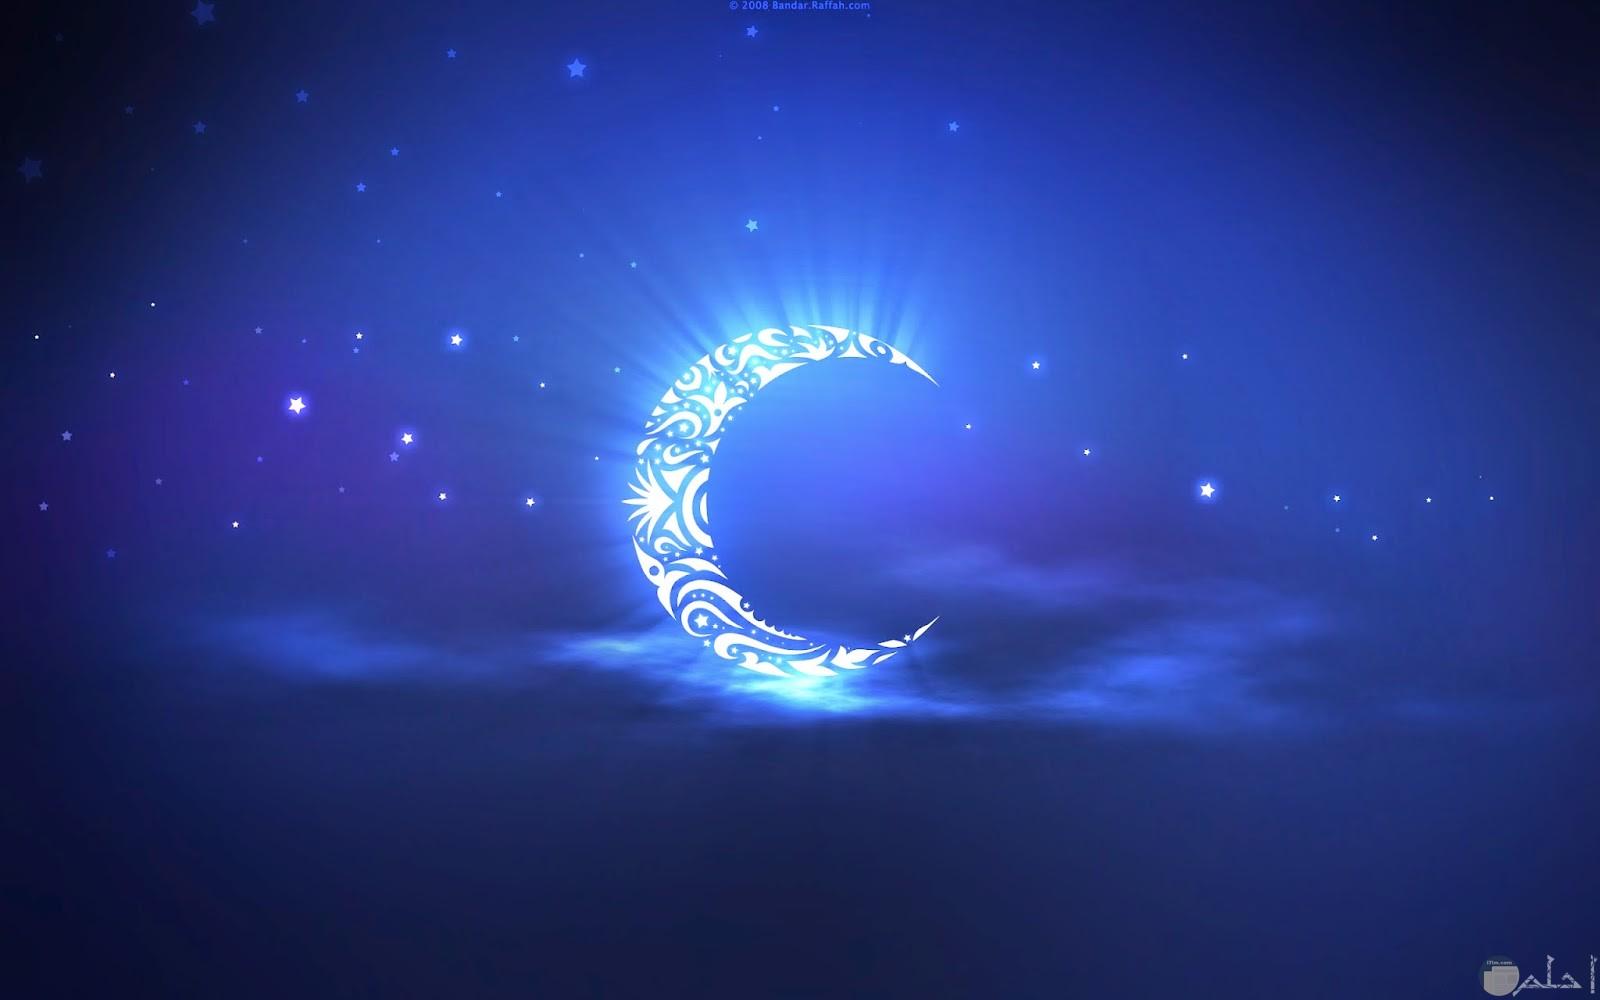 صورة هلال رمضان مرسوم بالدعوات.